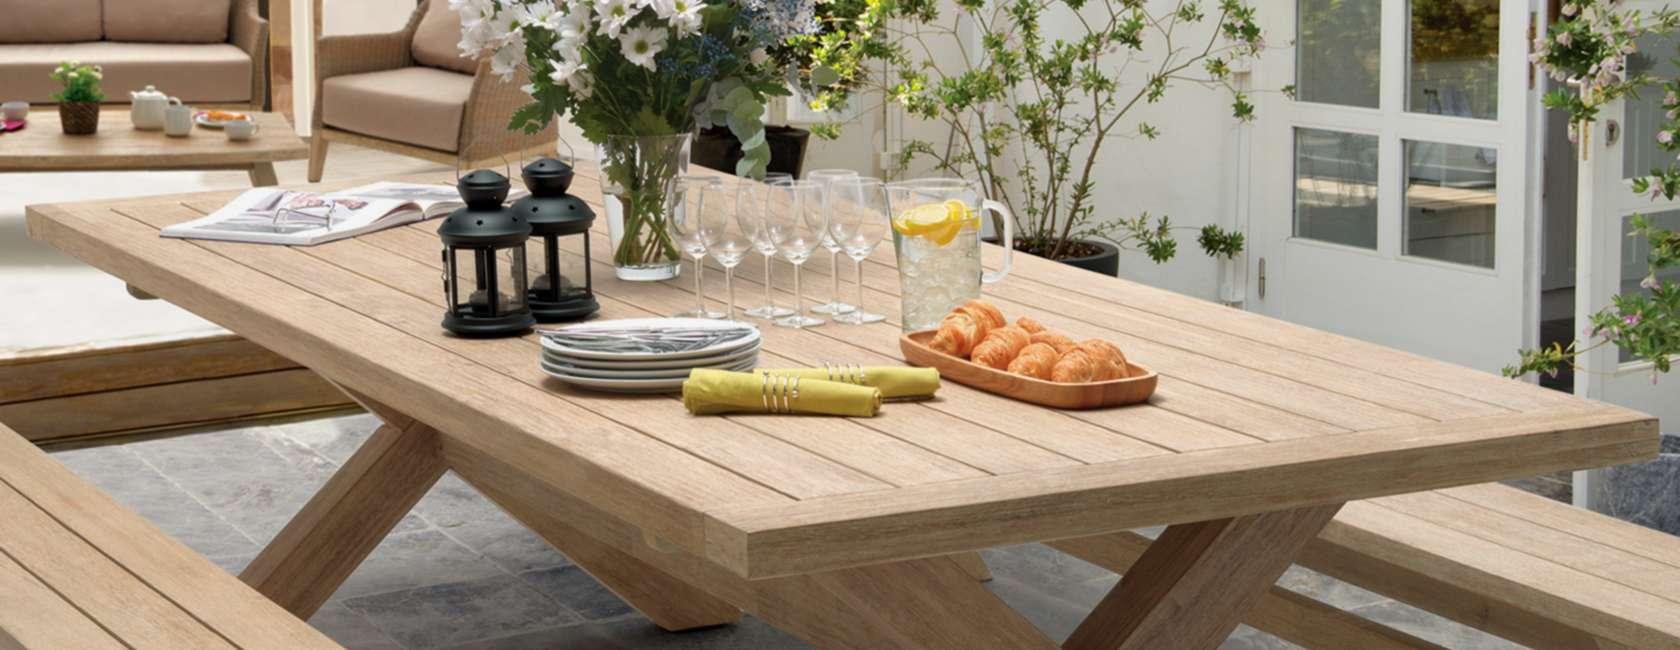 KETTLER Cora Outdoor Furniture at John Lewis & Partners